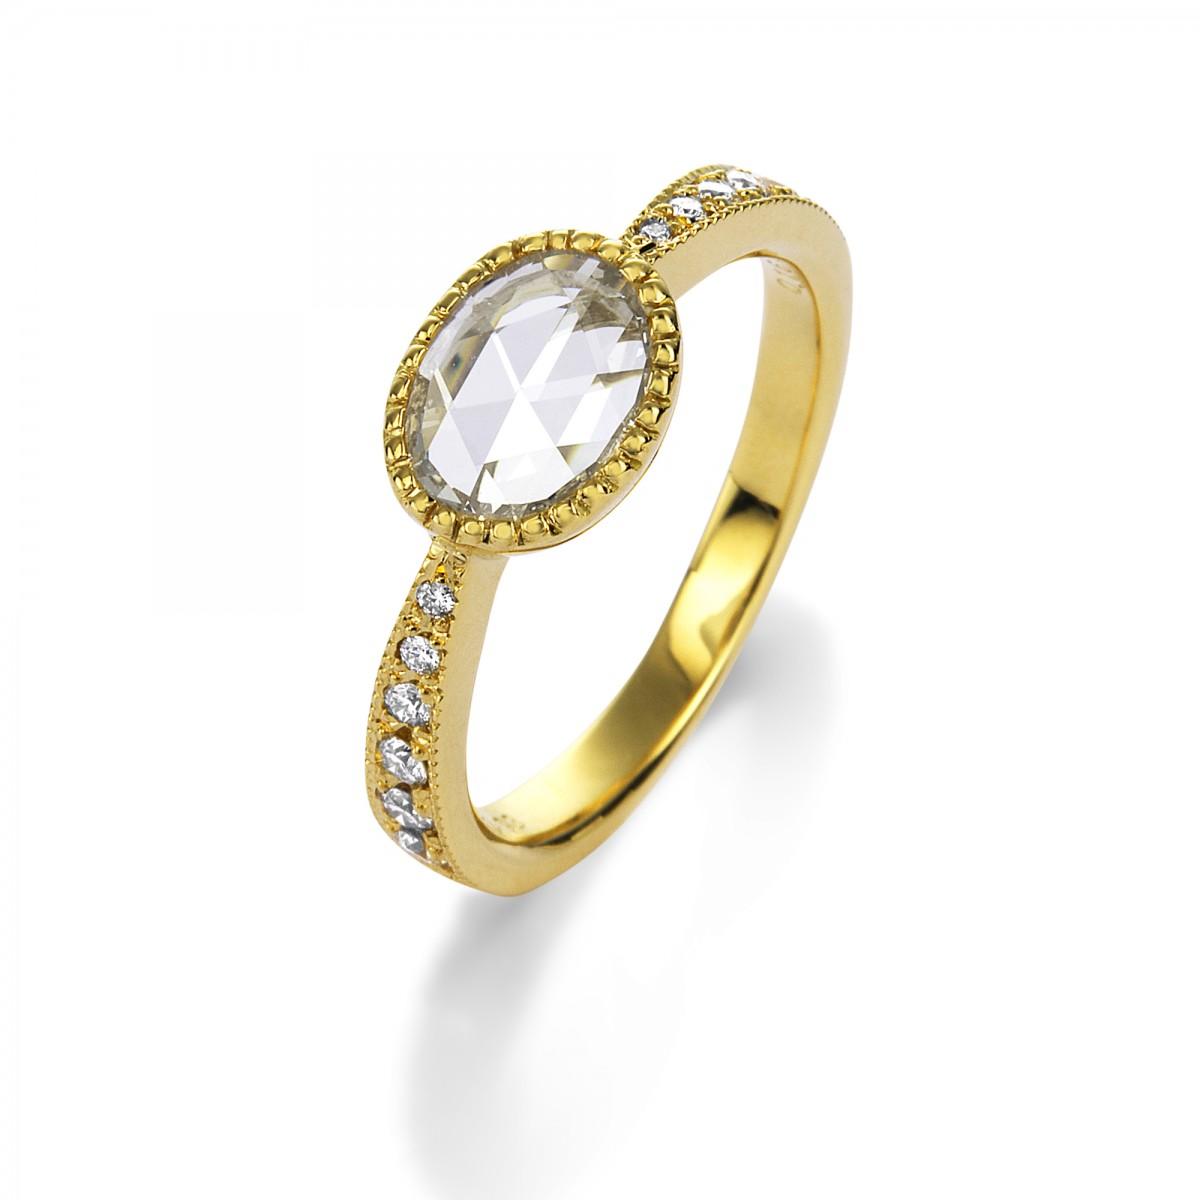 K18YG OVAL ROSE CUT DIAMOND RING BY MARK HIROSHI WILLIS